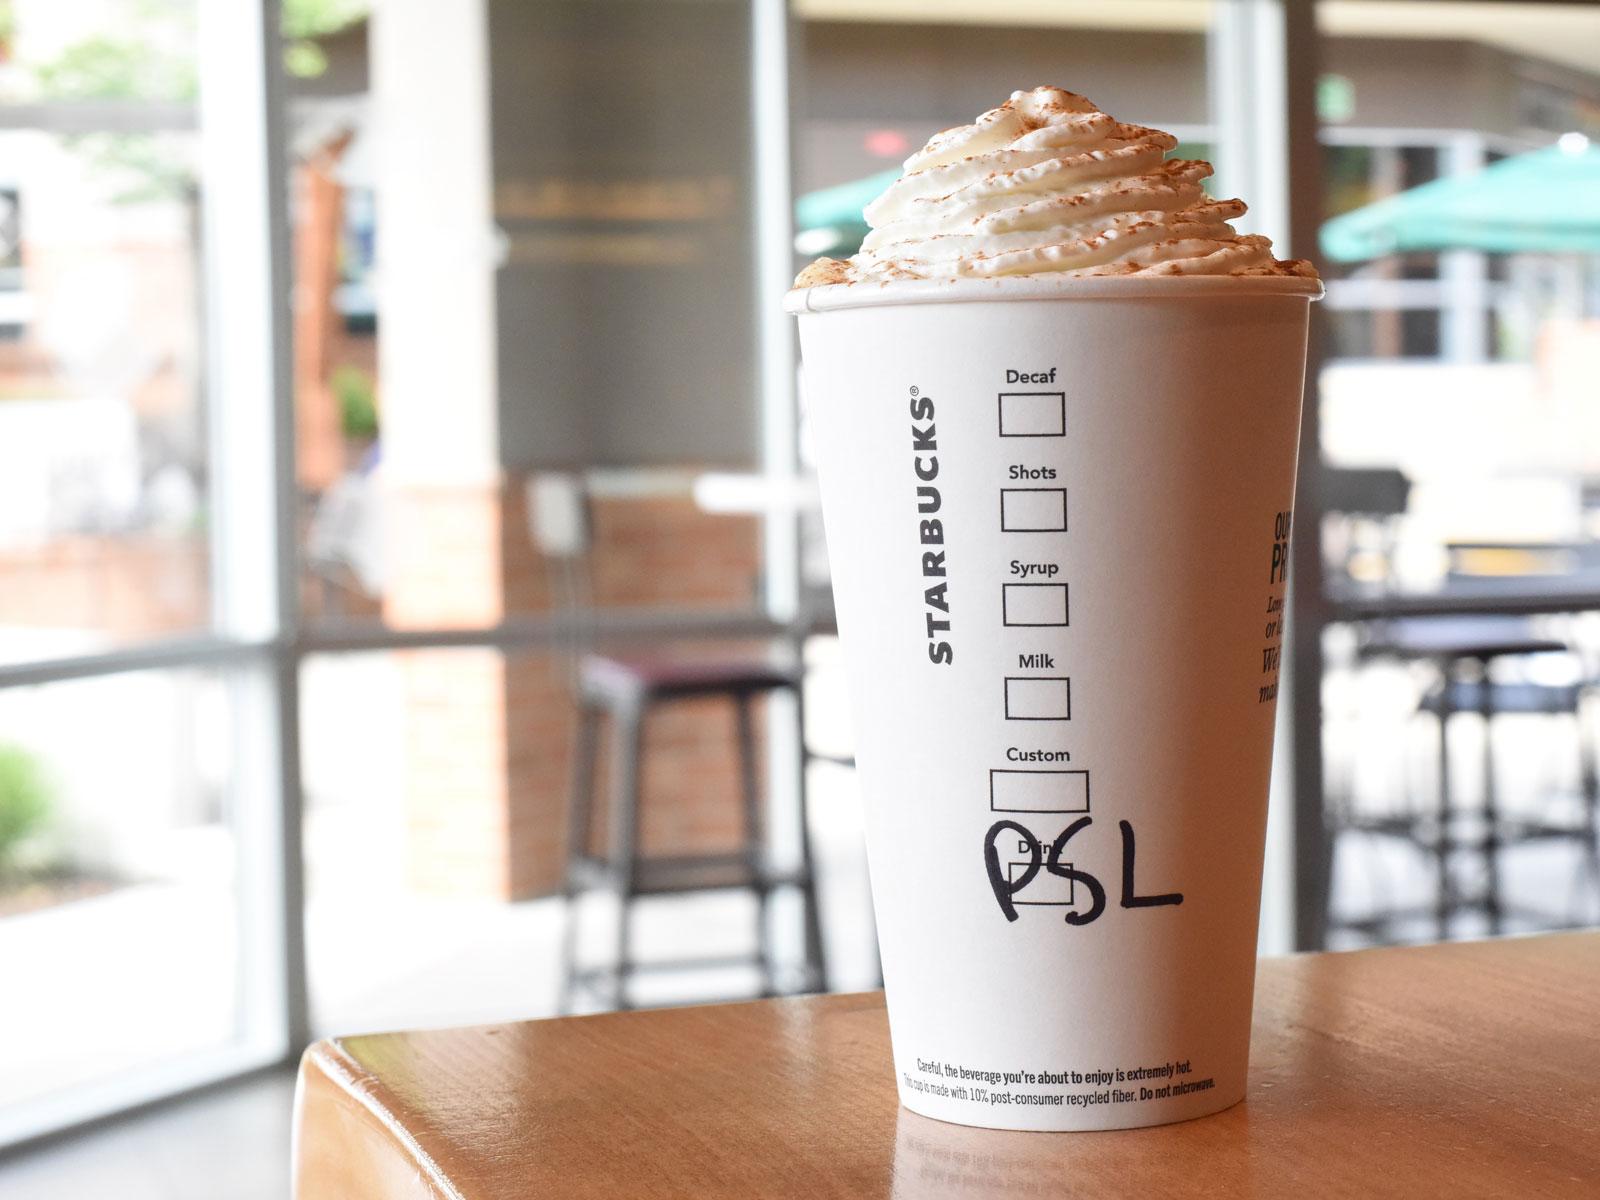 Starbucks Has a Hack for a (Slightly) Healthier Pumpkin Spice Latte